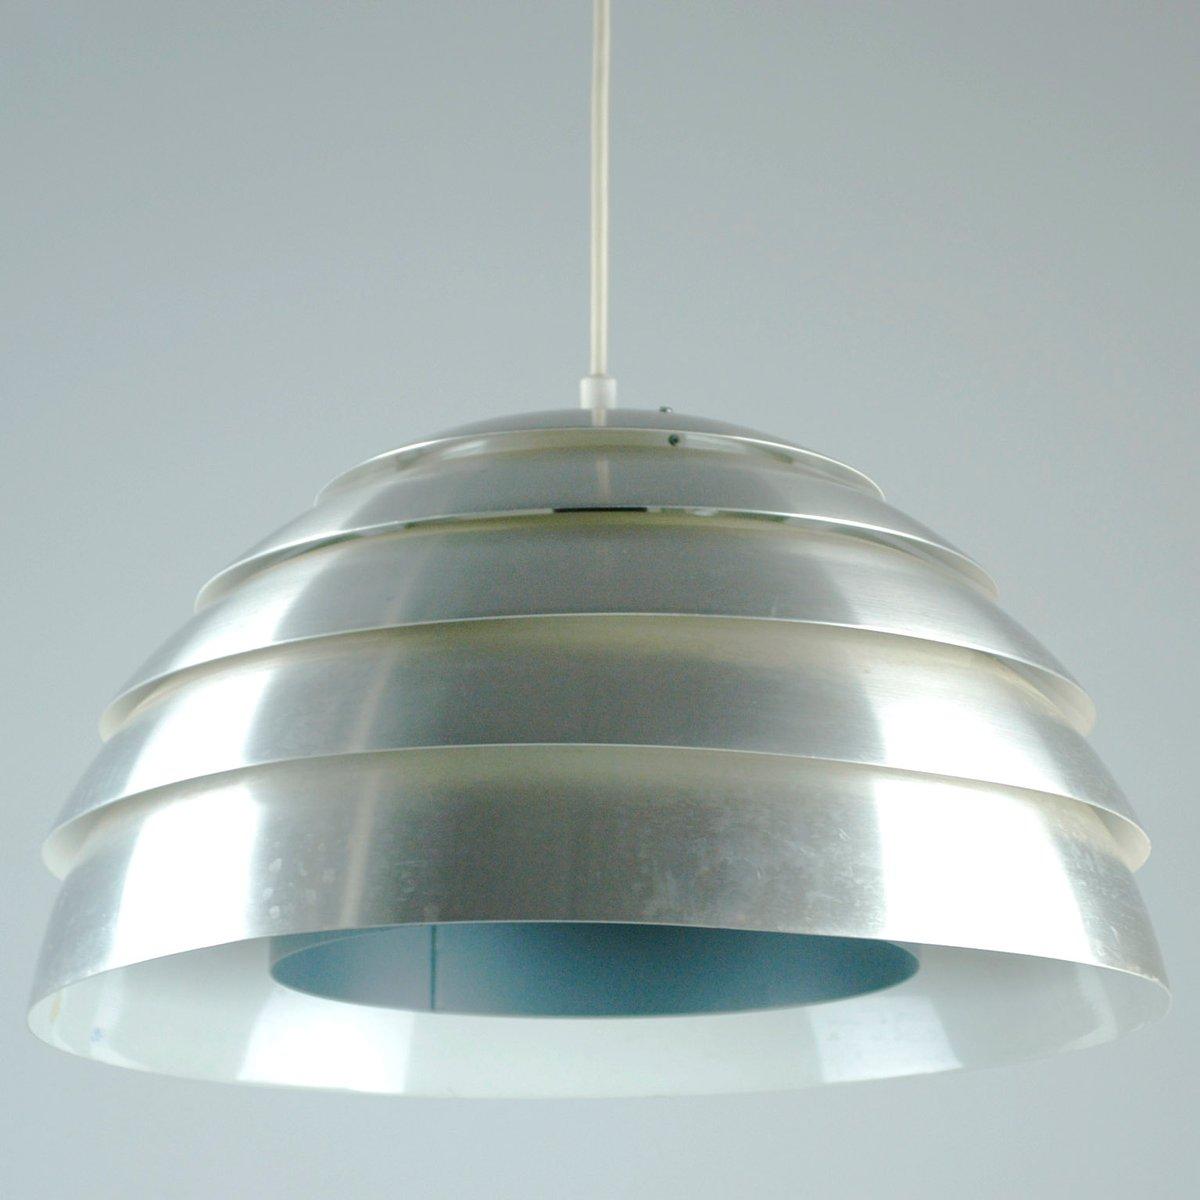 dome pendant light by hans agne jakobsson for markaryd. Black Bedroom Furniture Sets. Home Design Ideas